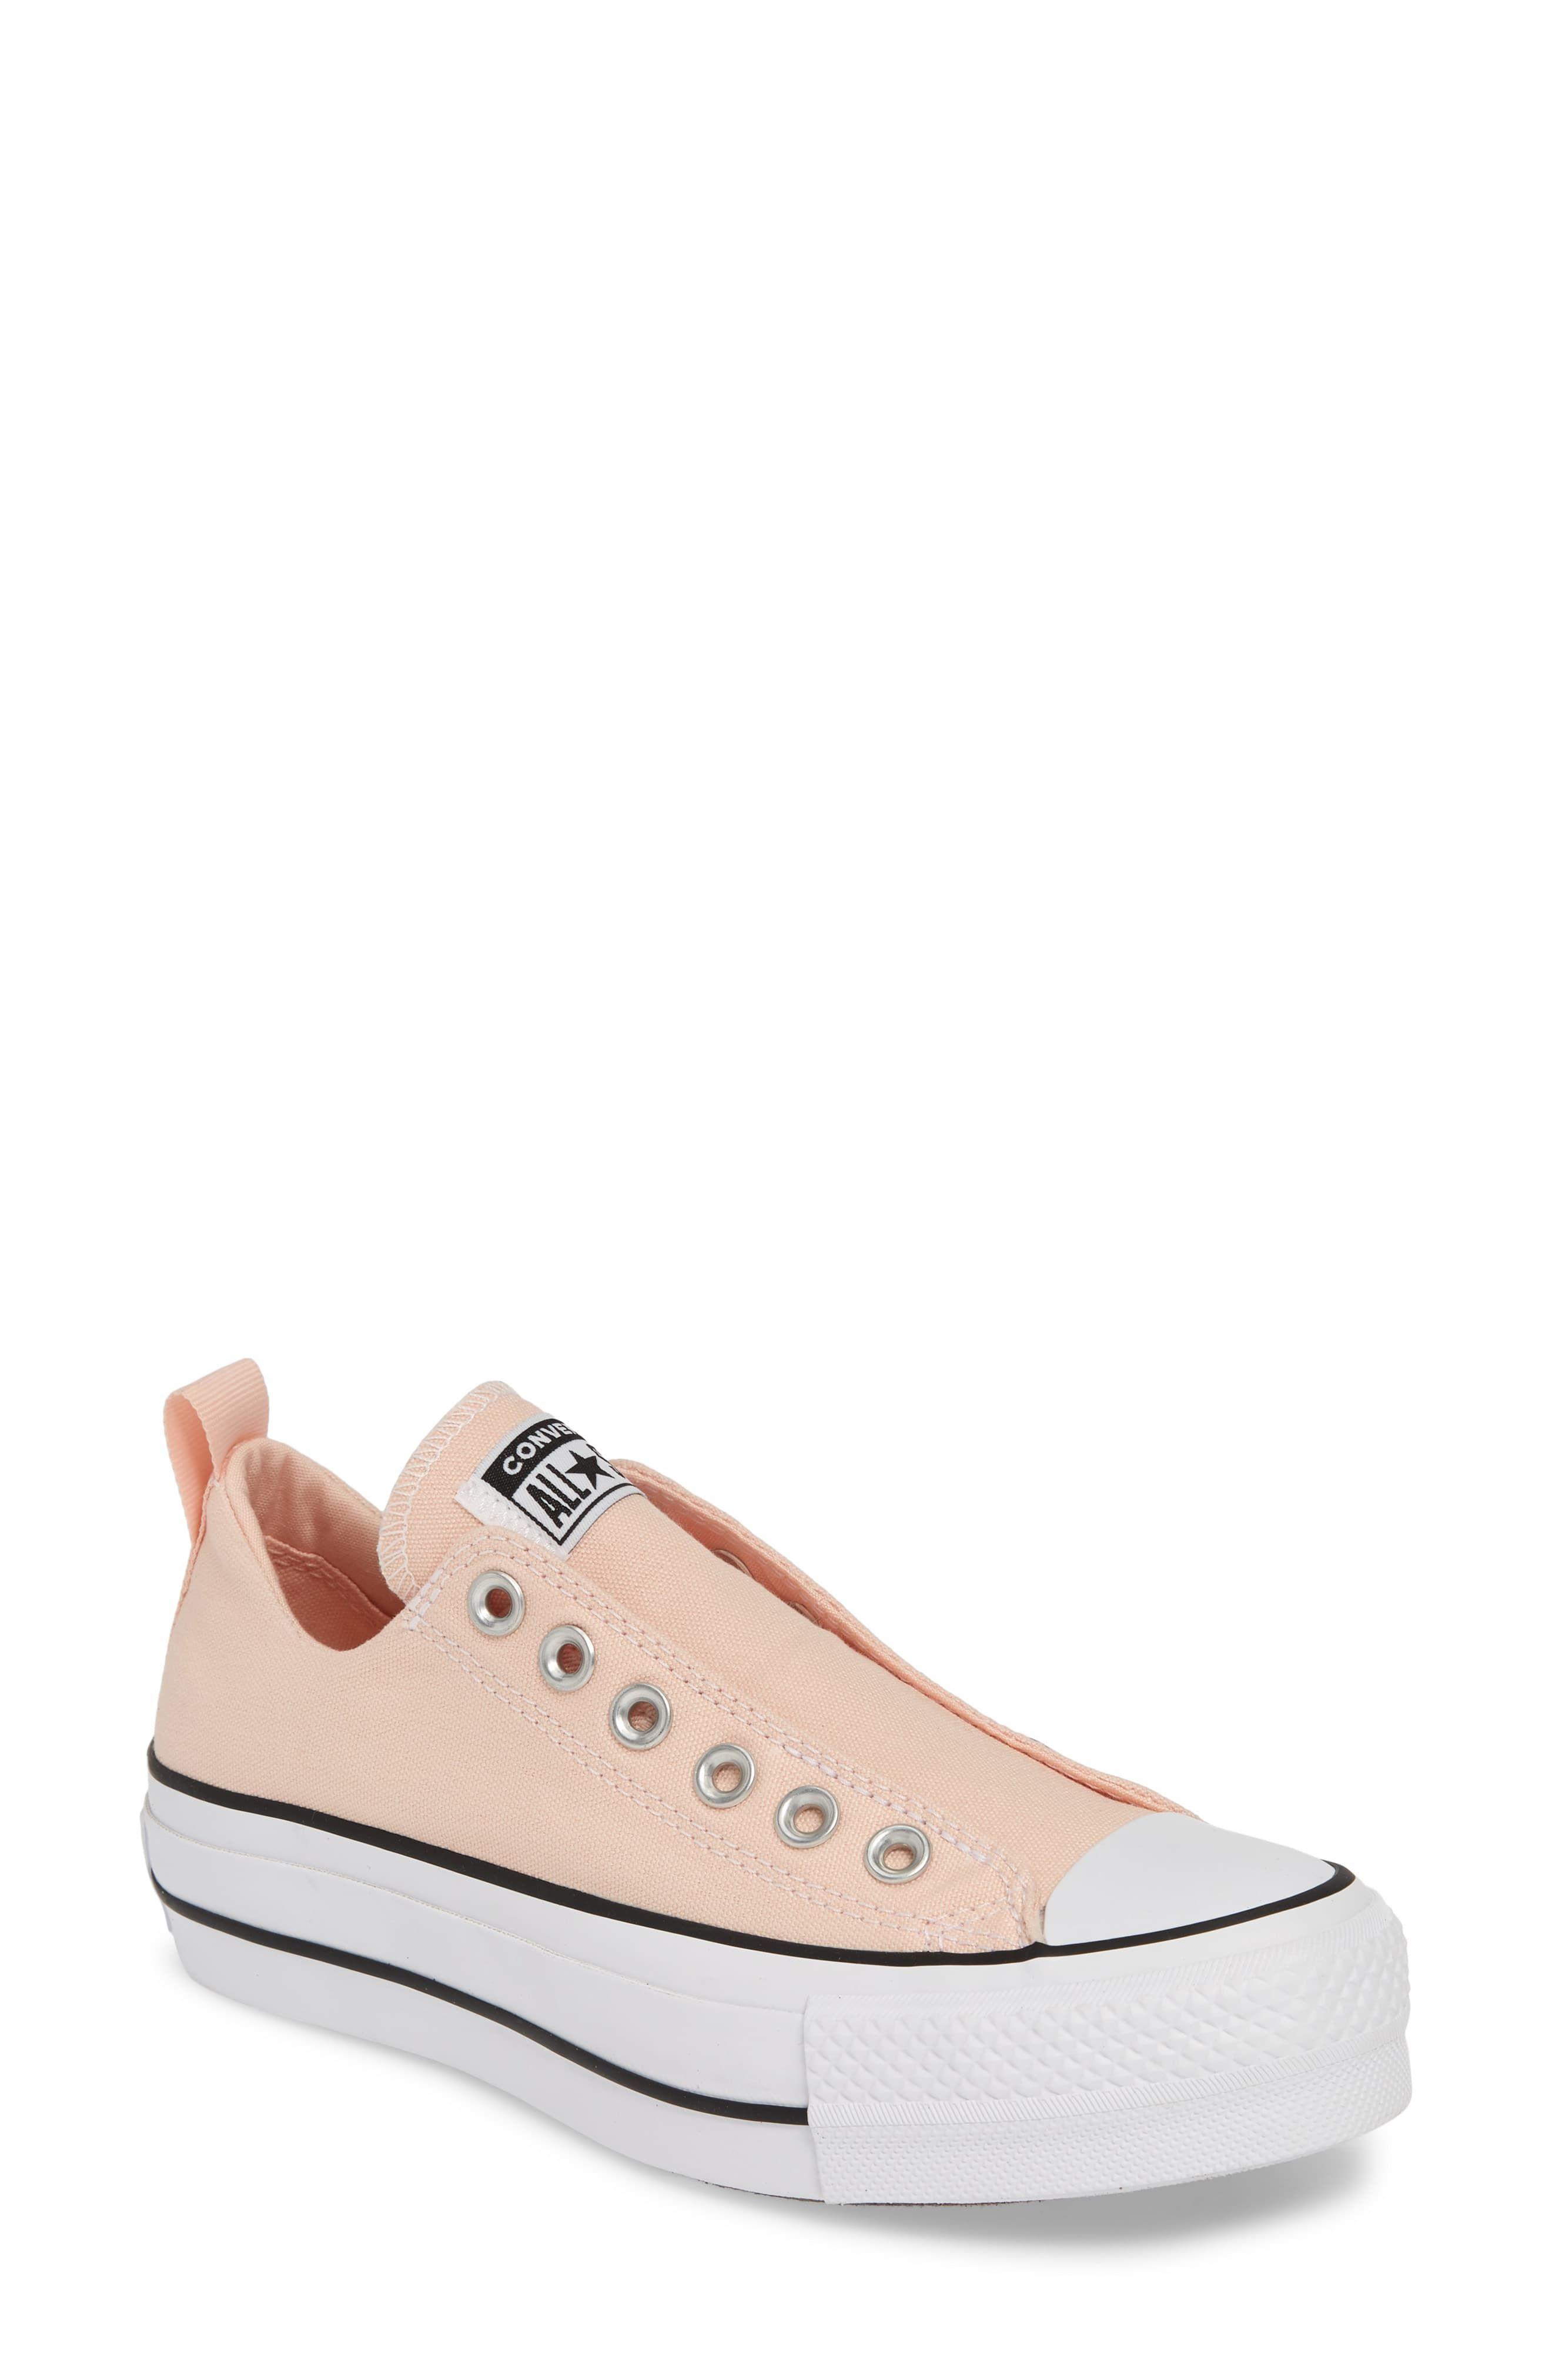 Women's Converse Chuck Taylor All Star Lift Slip On Sneaker